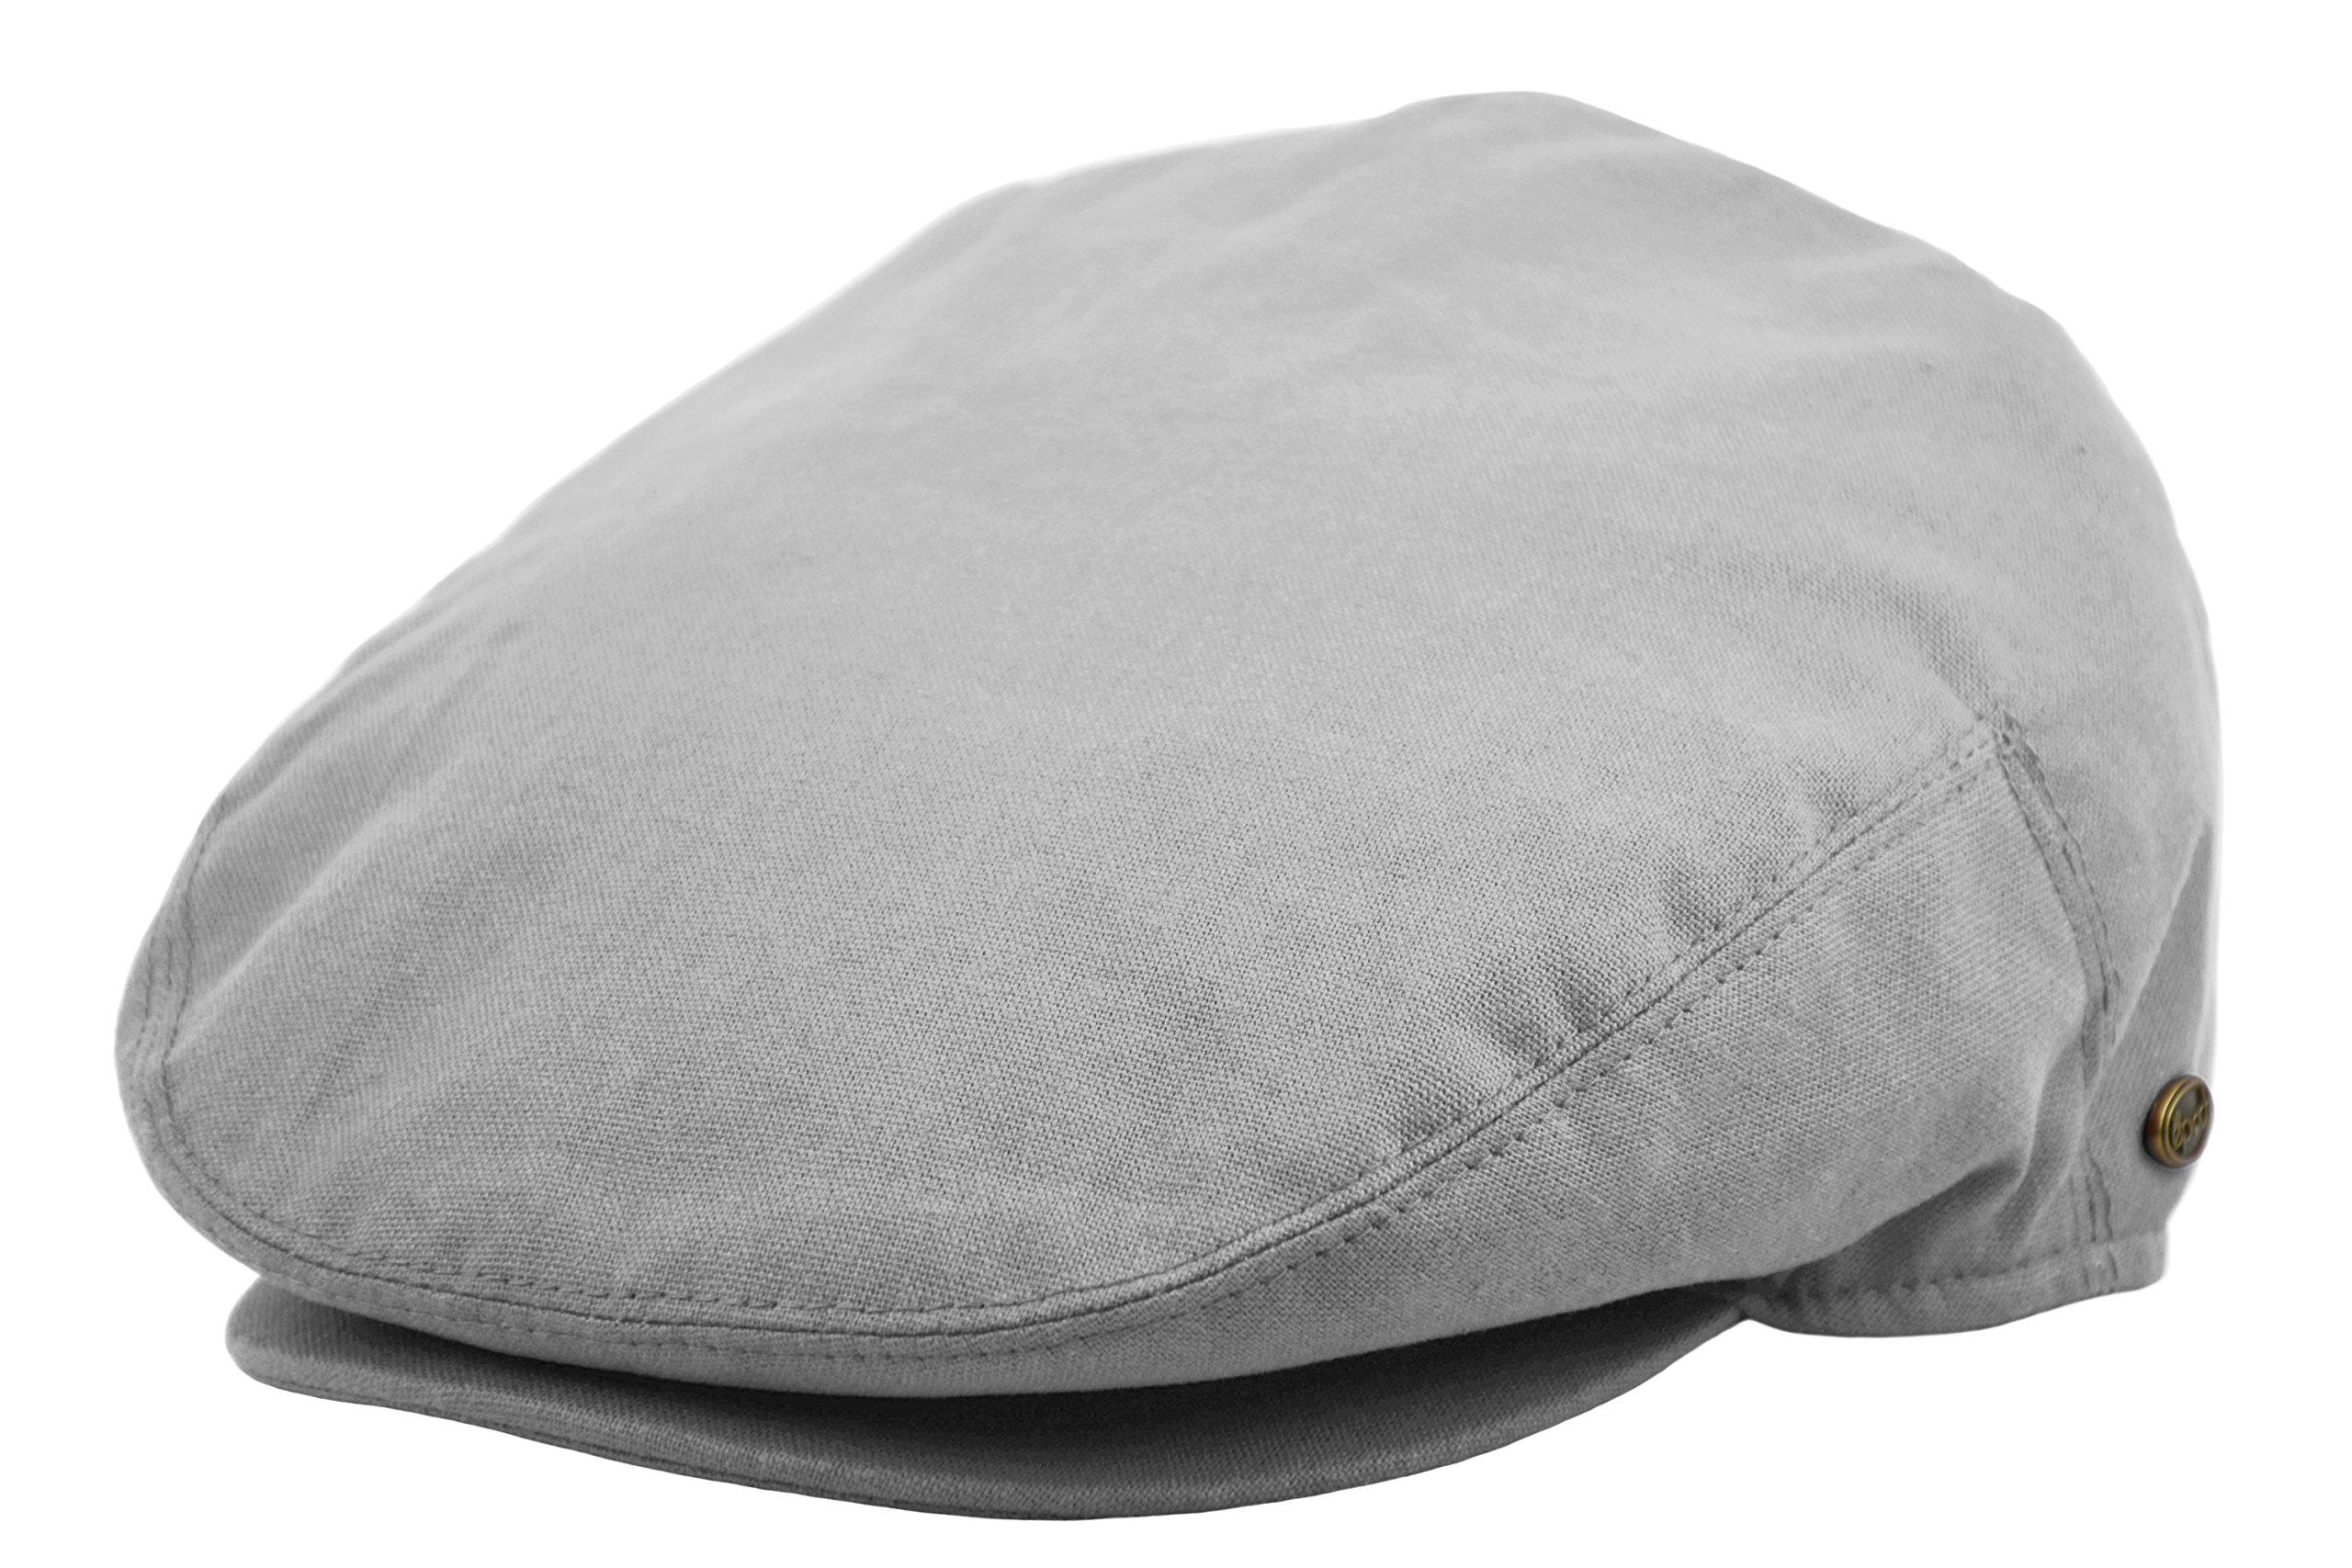 Plain Cotton IVY Summer newsboy Cap Driving Cabbie Flat Cap Snap Brim (X-Large, Light Gray)